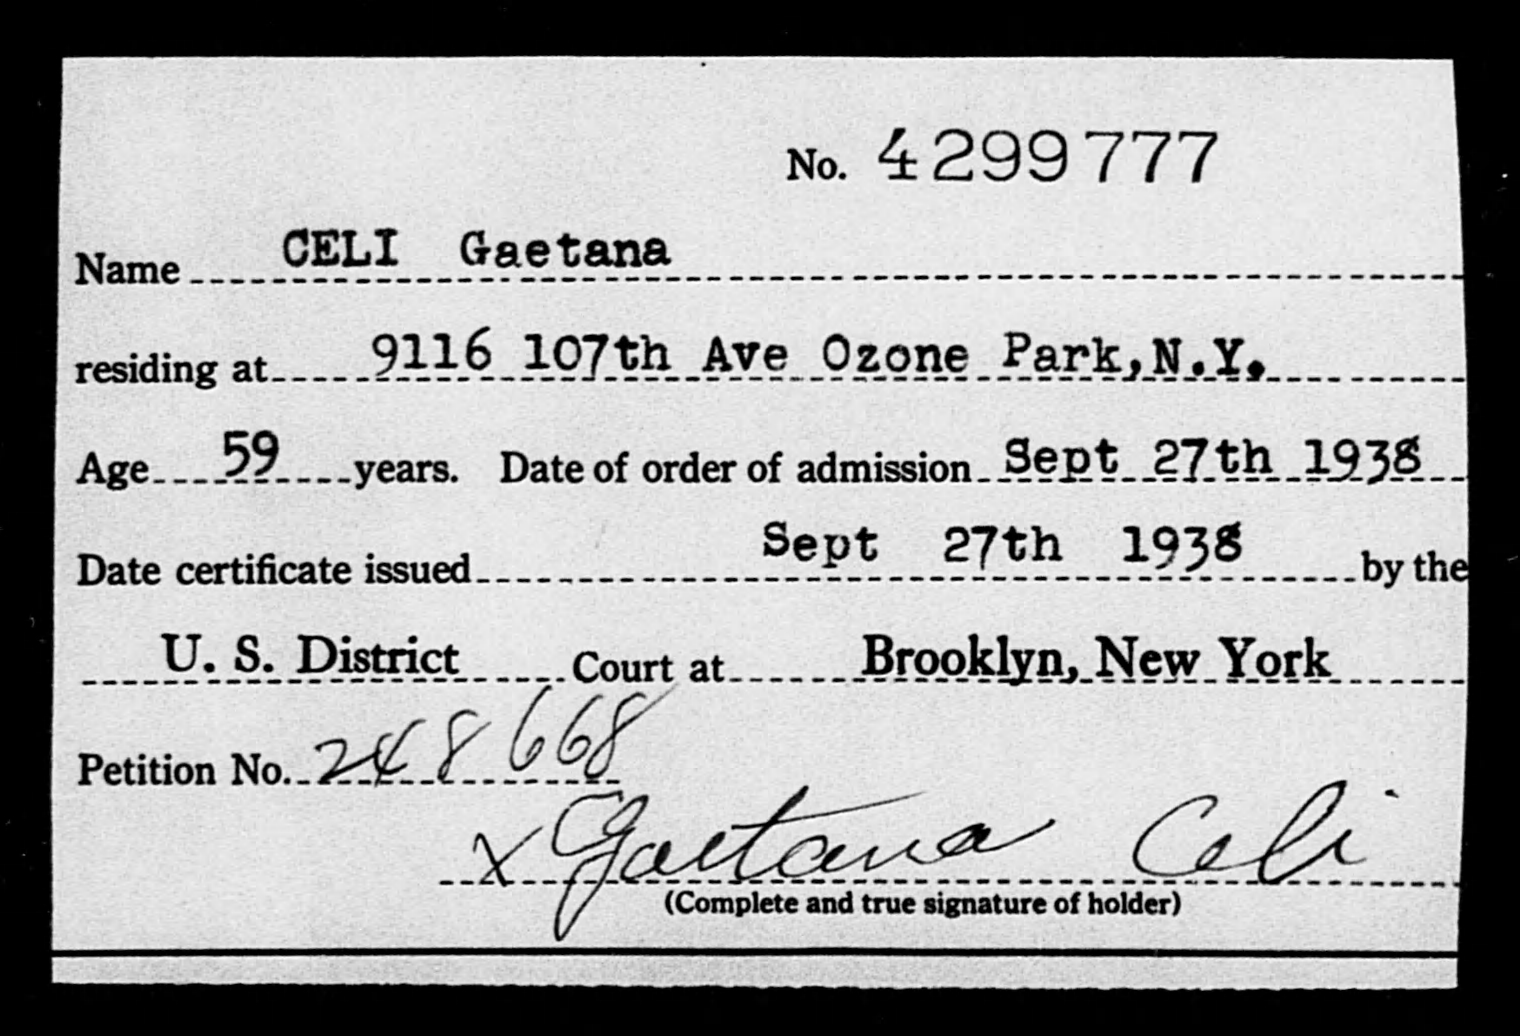 CELI Gaetana - Born: [BLANK], Naturalized: 1938